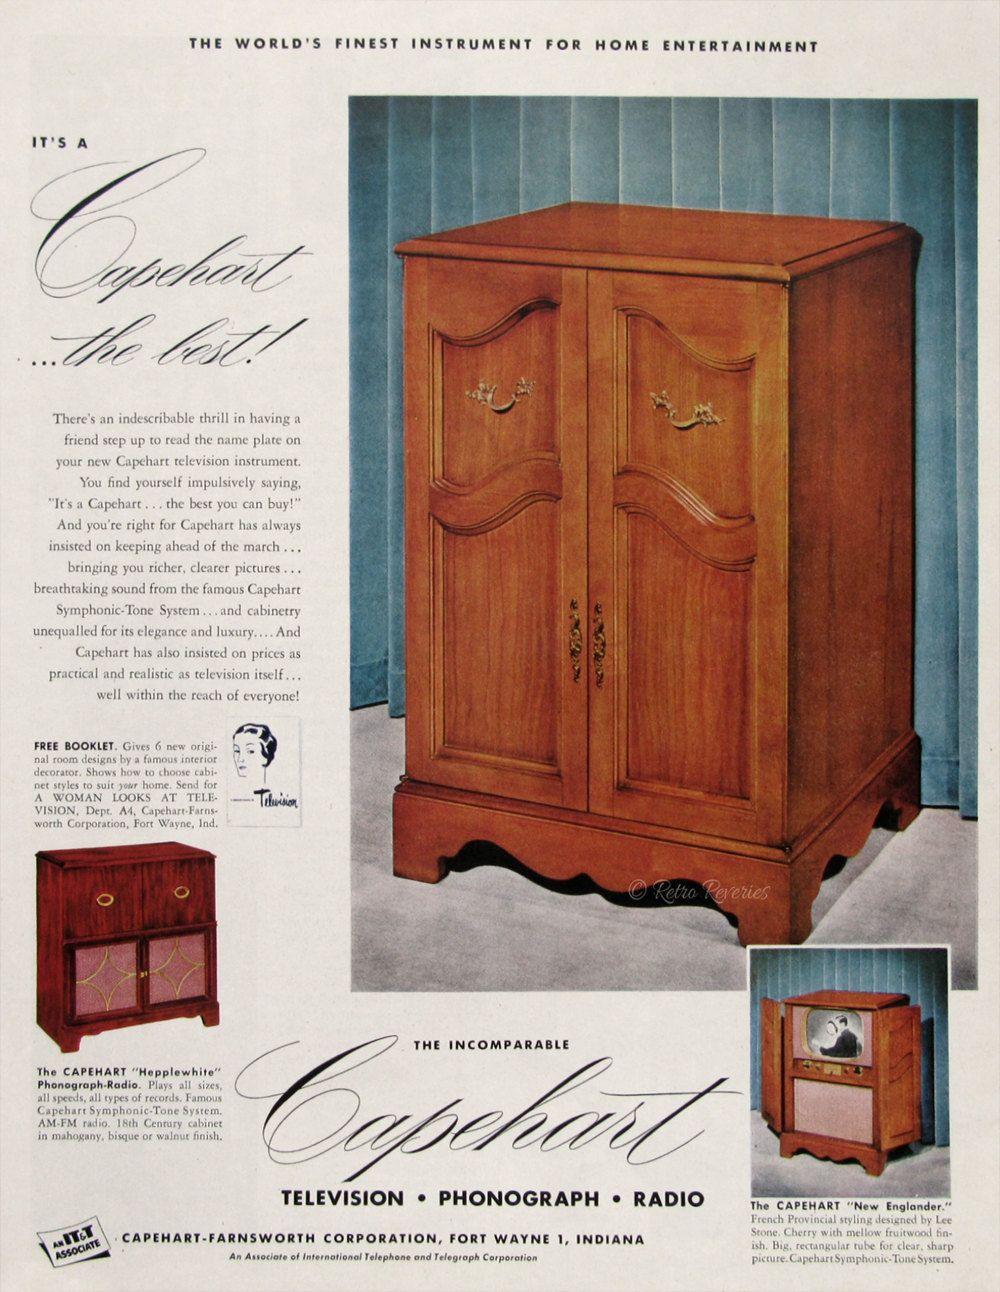 1951 Capehart New Englander Television Cabinet Ad   Retro Wood TV Cabinet    Capehart Symphonic Tone System   Furniture Advertisement